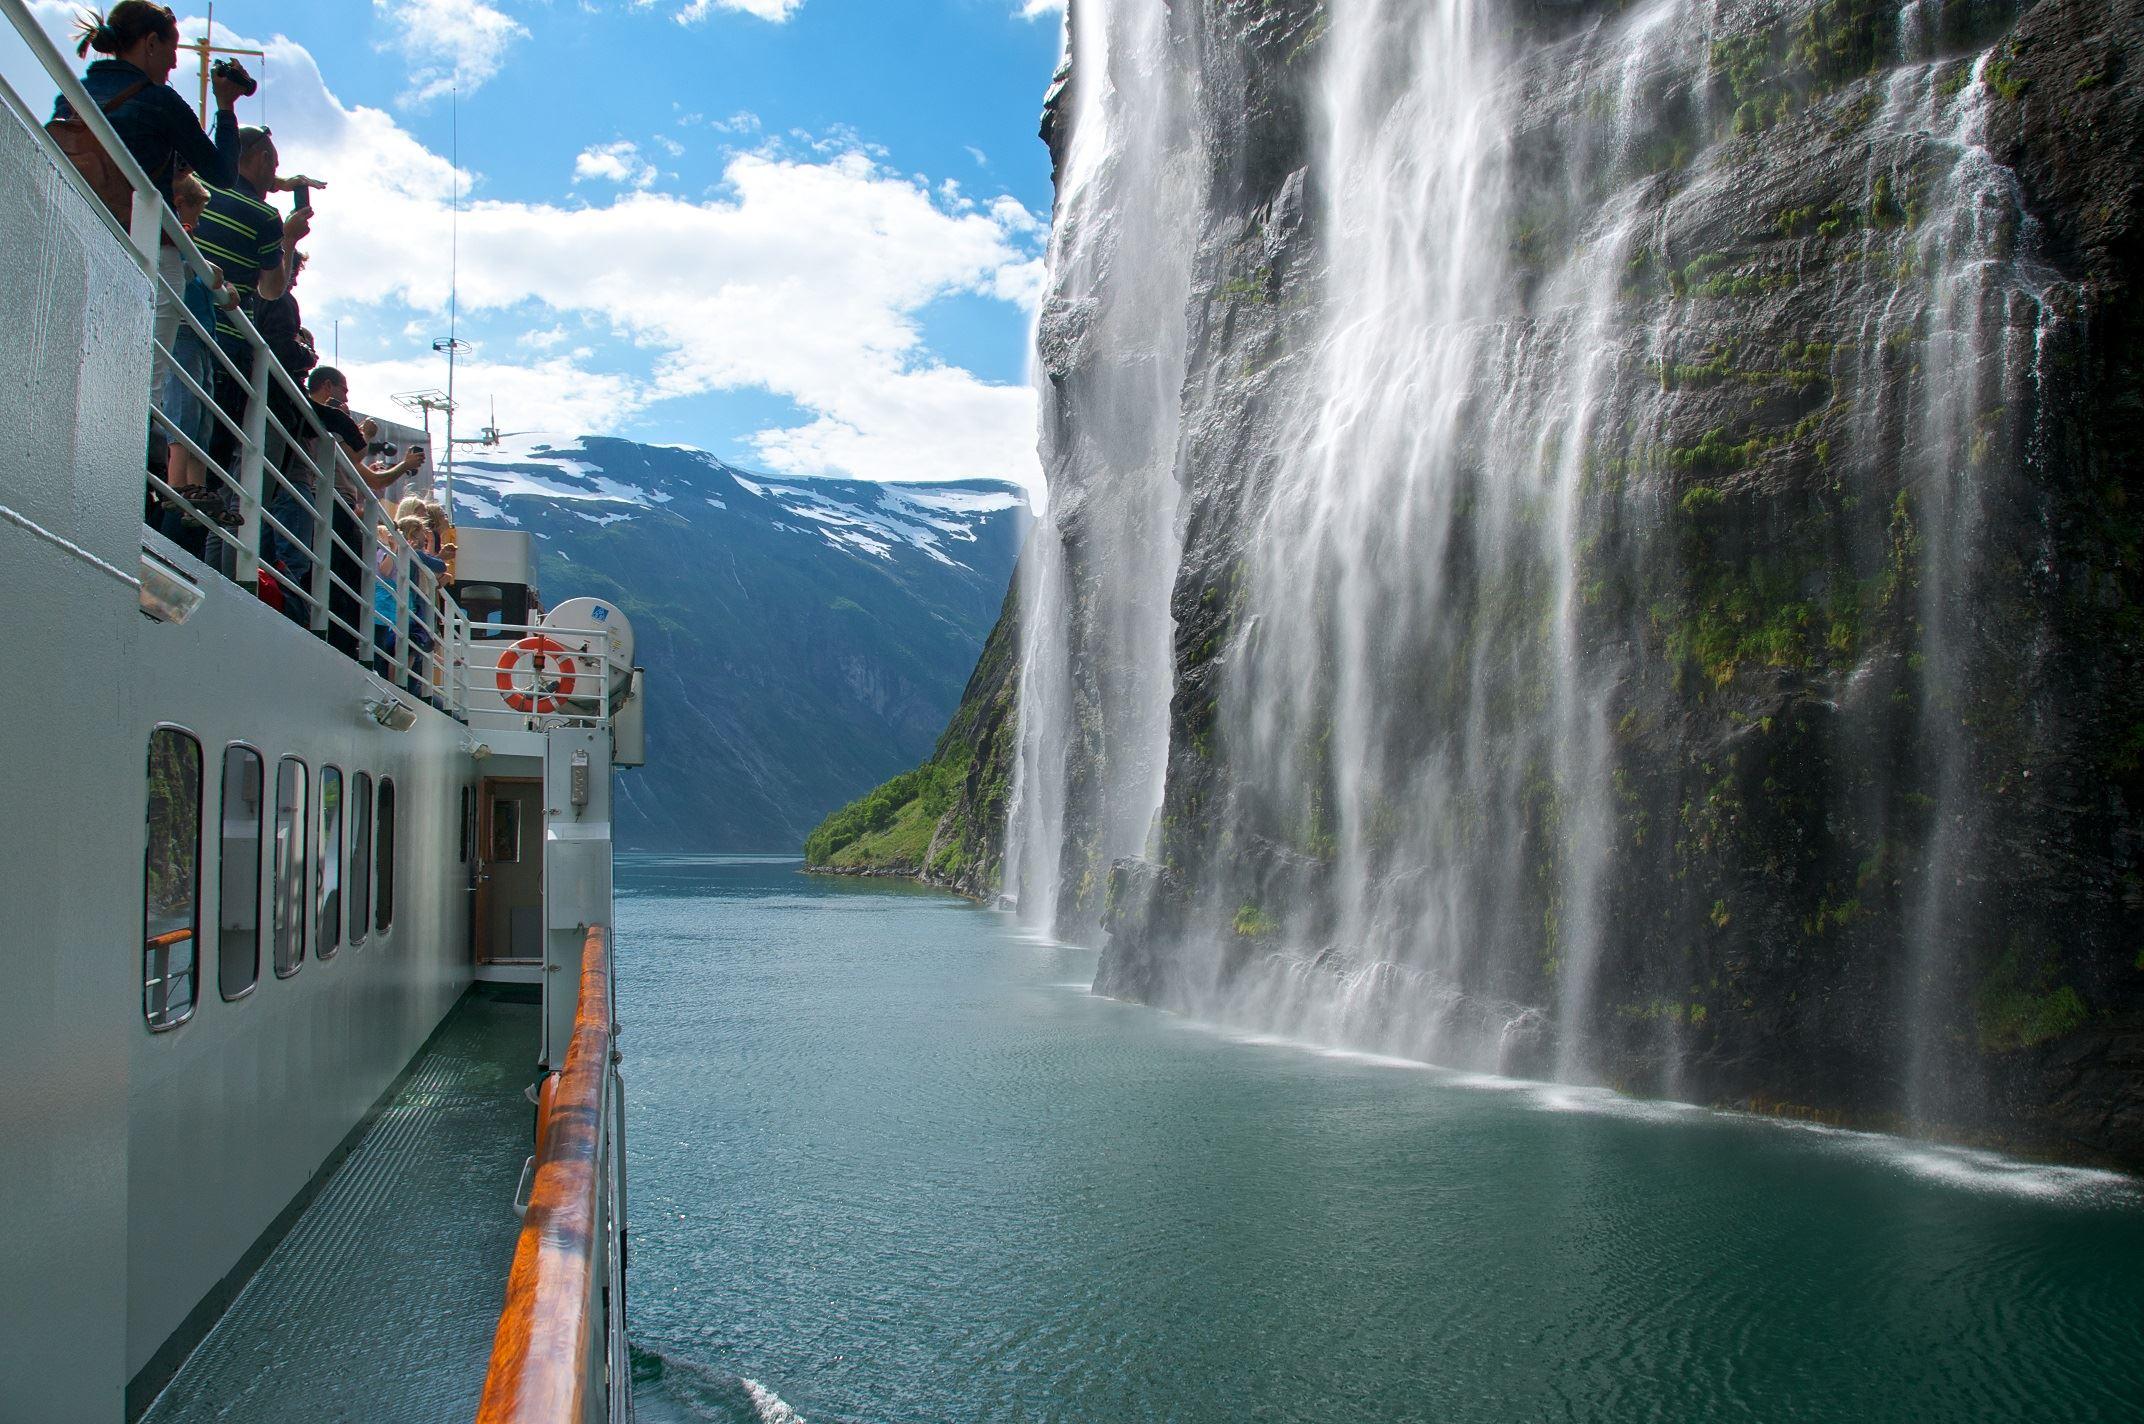 Øyvind Heen - Visit Norway, Fjord Cruise Geirangerfjord GRP